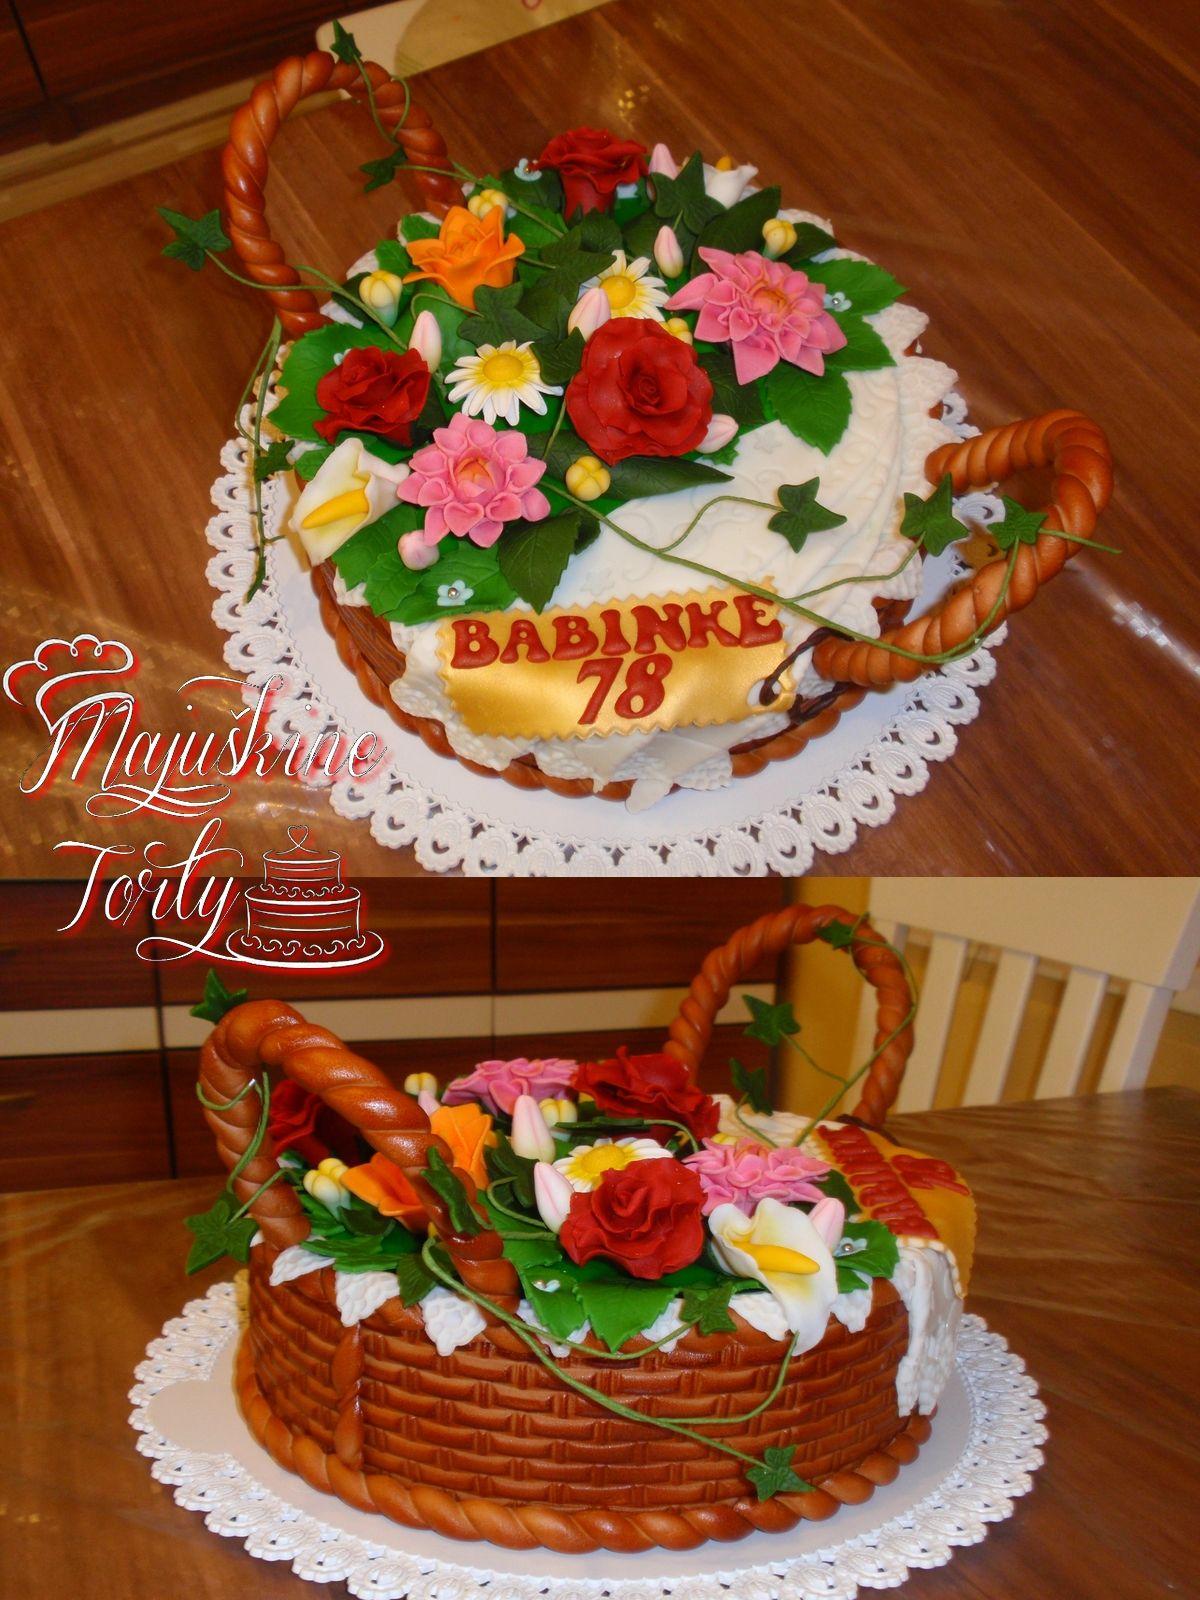 My First Flower Basket Cake Birthday Cake Basket Full Of